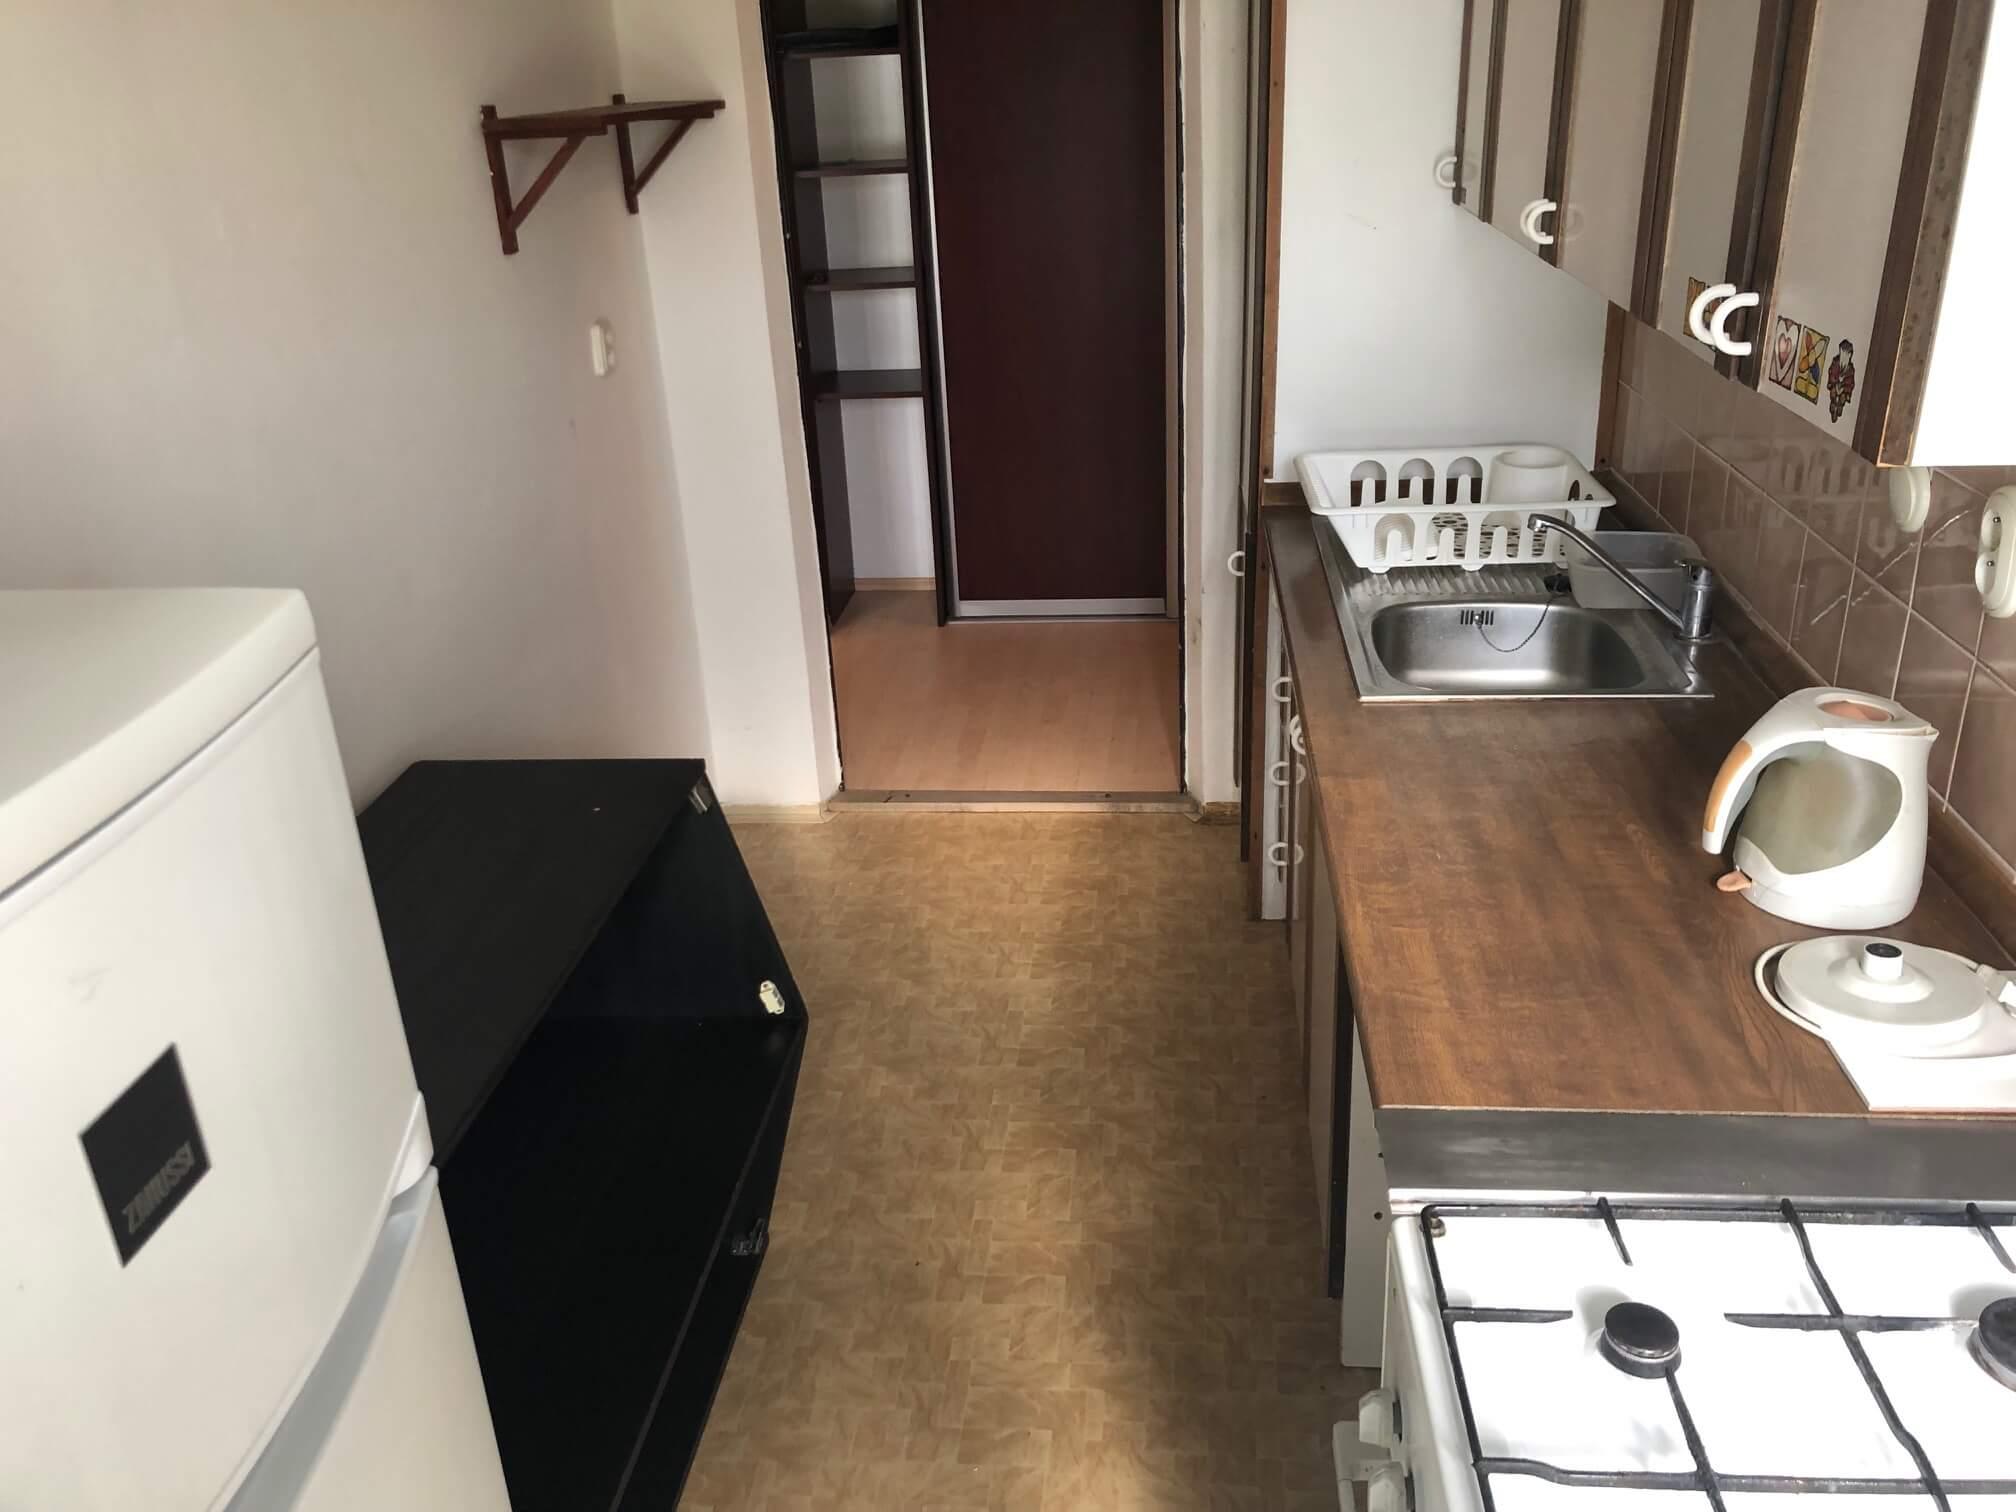 3 izbový byt, Račianska 85, 63m2, balkon 10m2, výborná lokalita-5